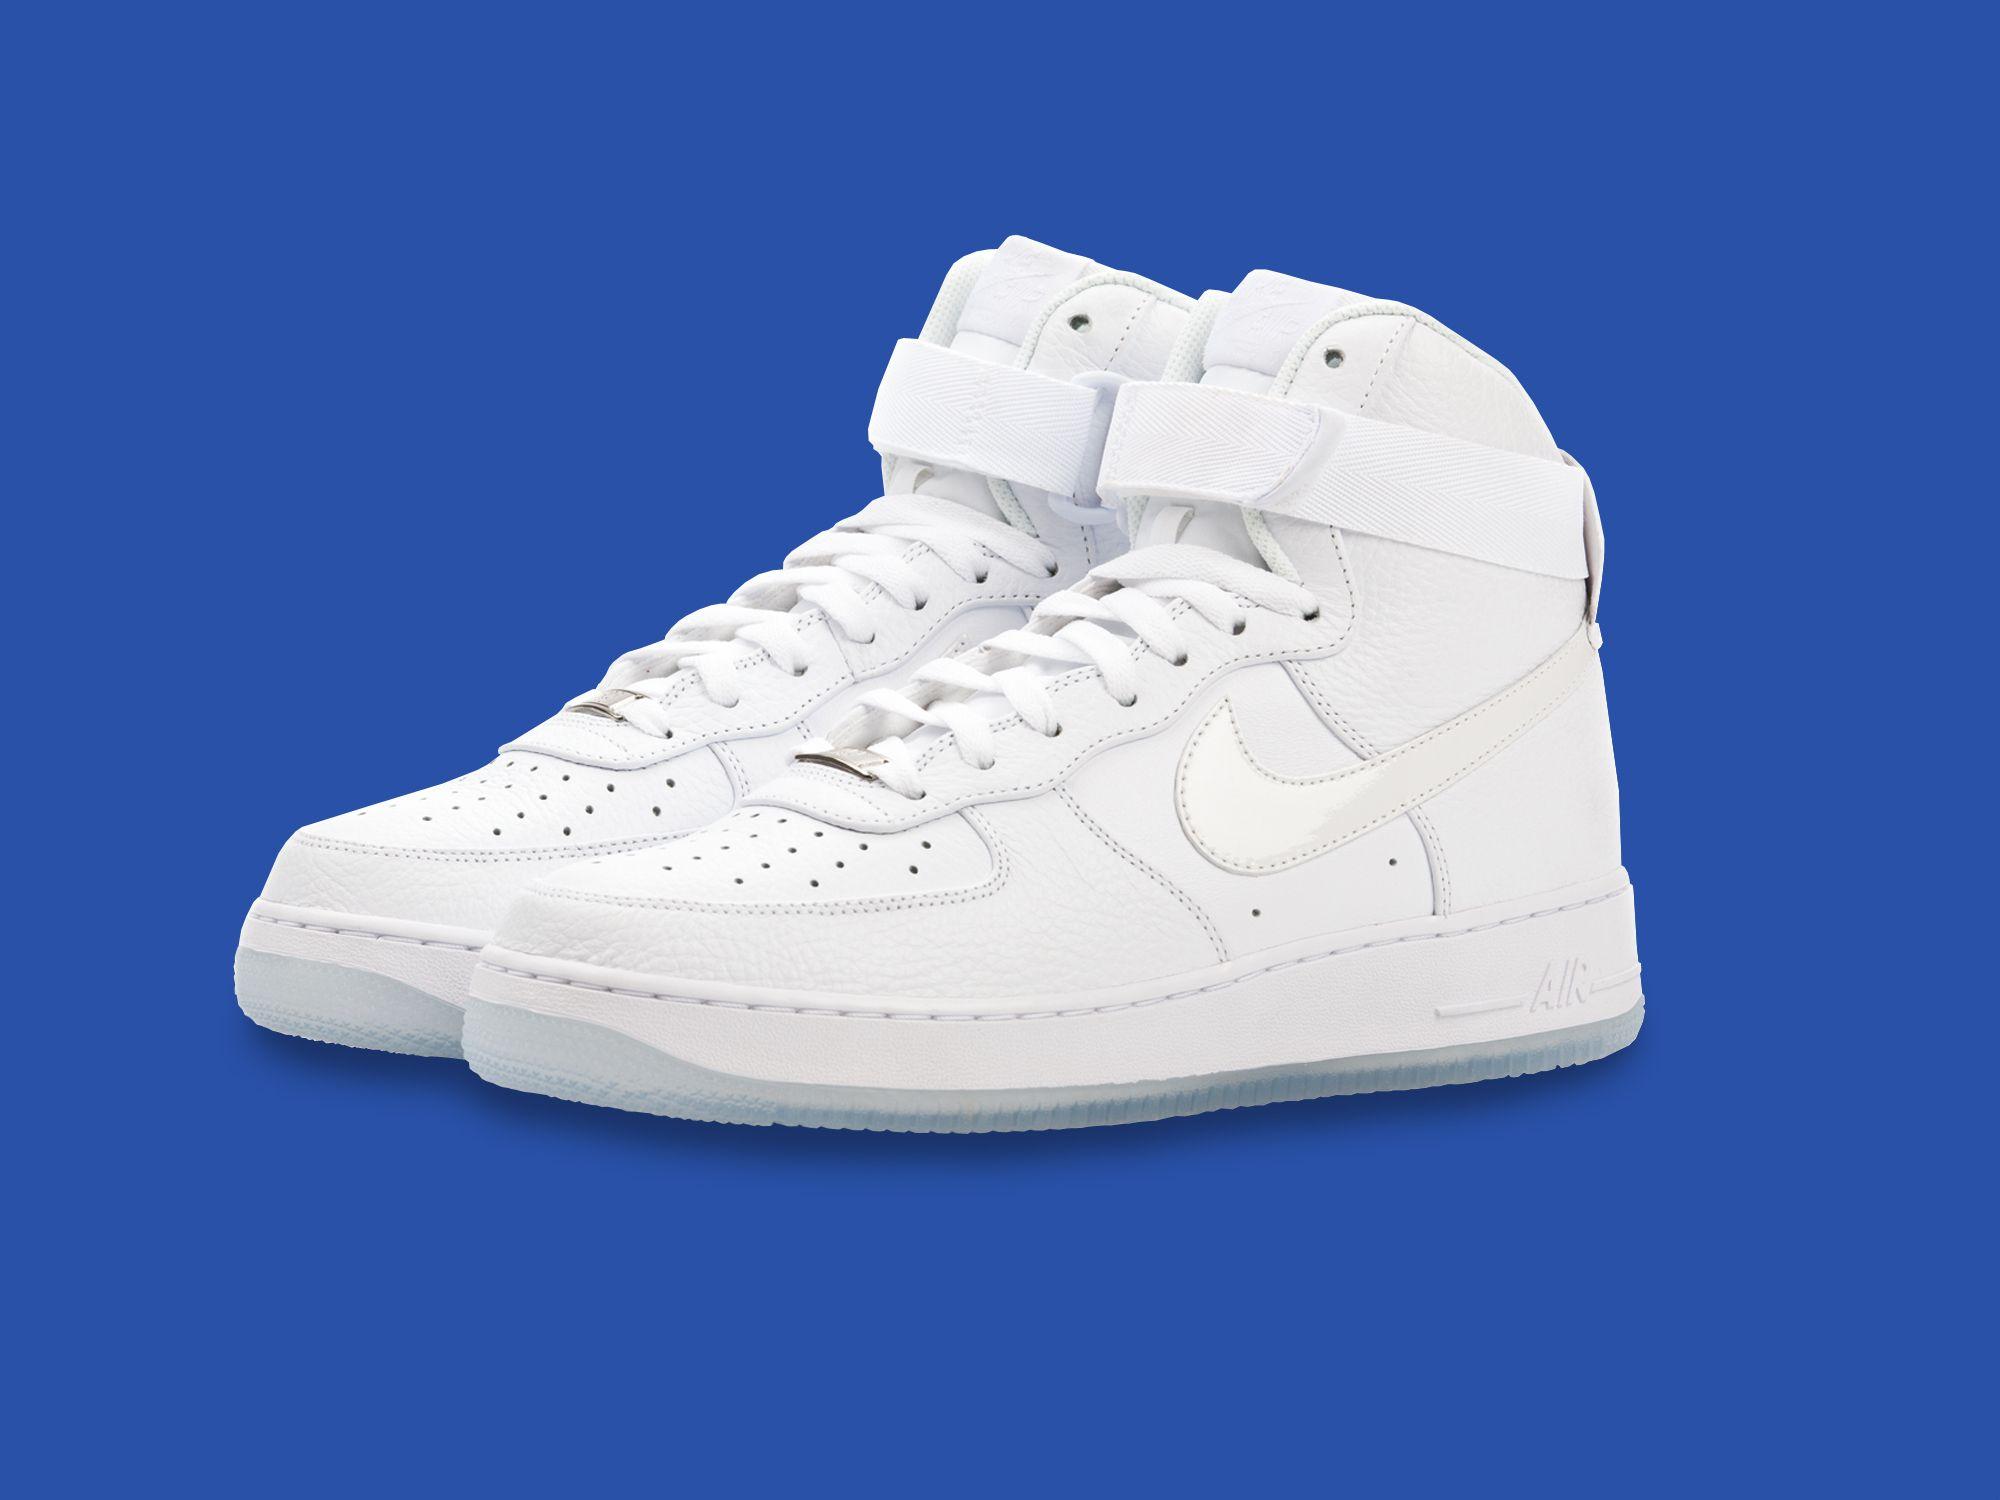 nike air force all white high tops